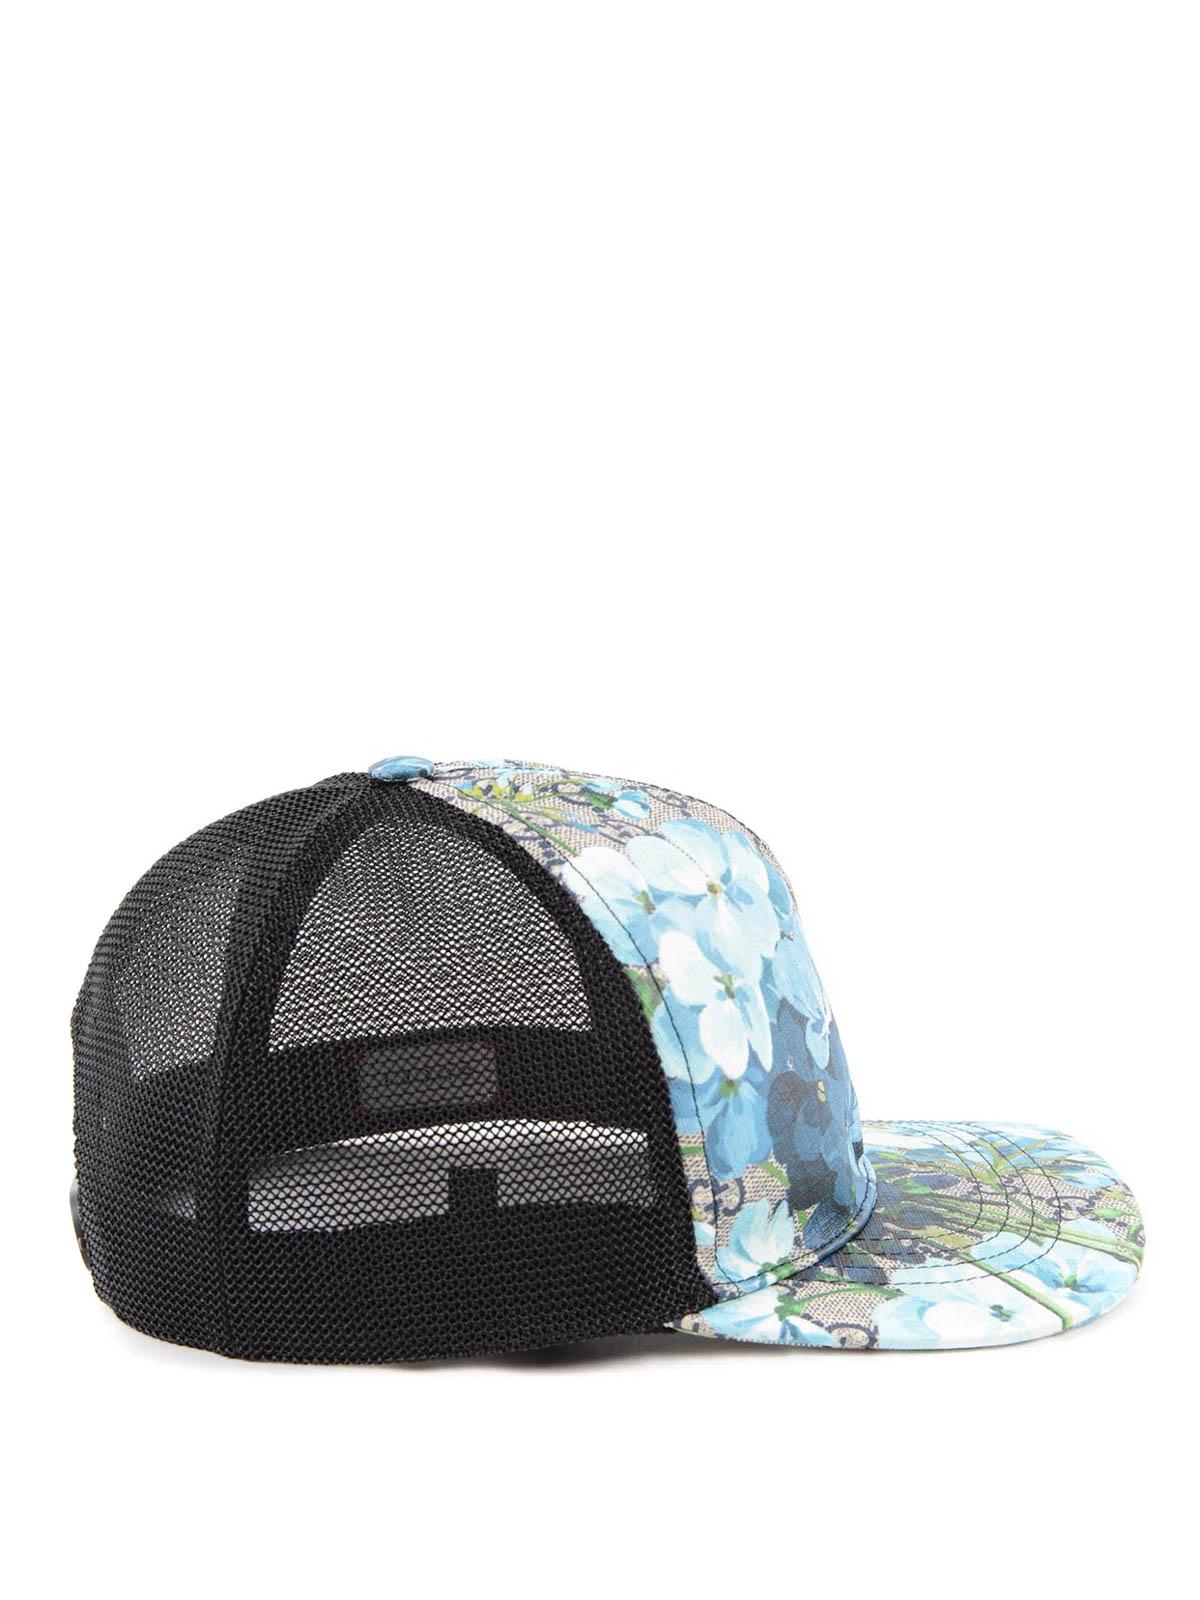 Gucci - GG Blooms baseball hat - hats   caps - 426887 4HA05 2168 7b57d06b427